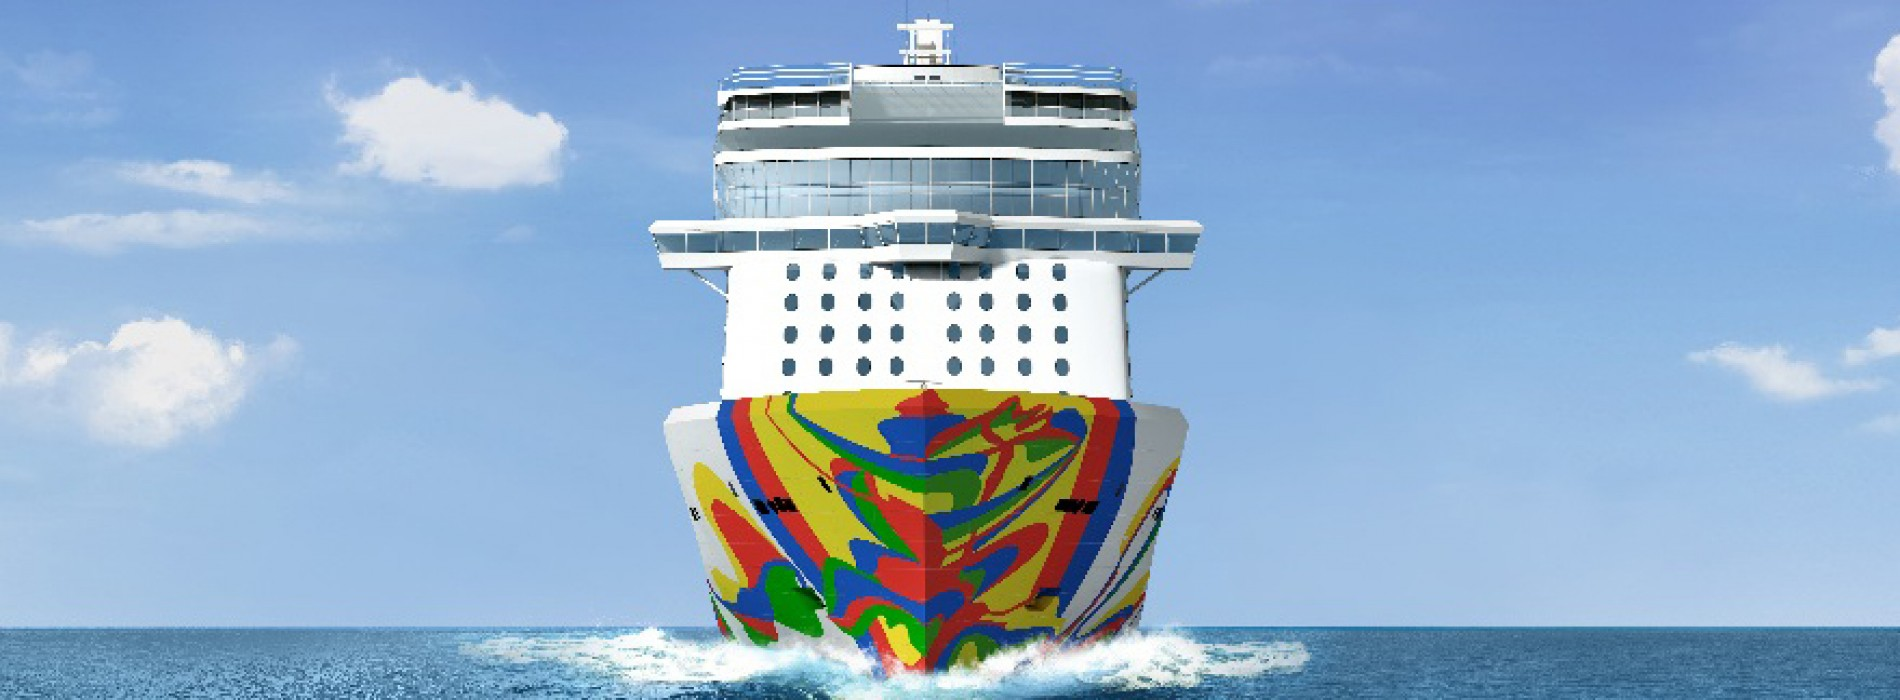 Norwegian Cruise Line unveils Hull Artwork for Norwegian Encore